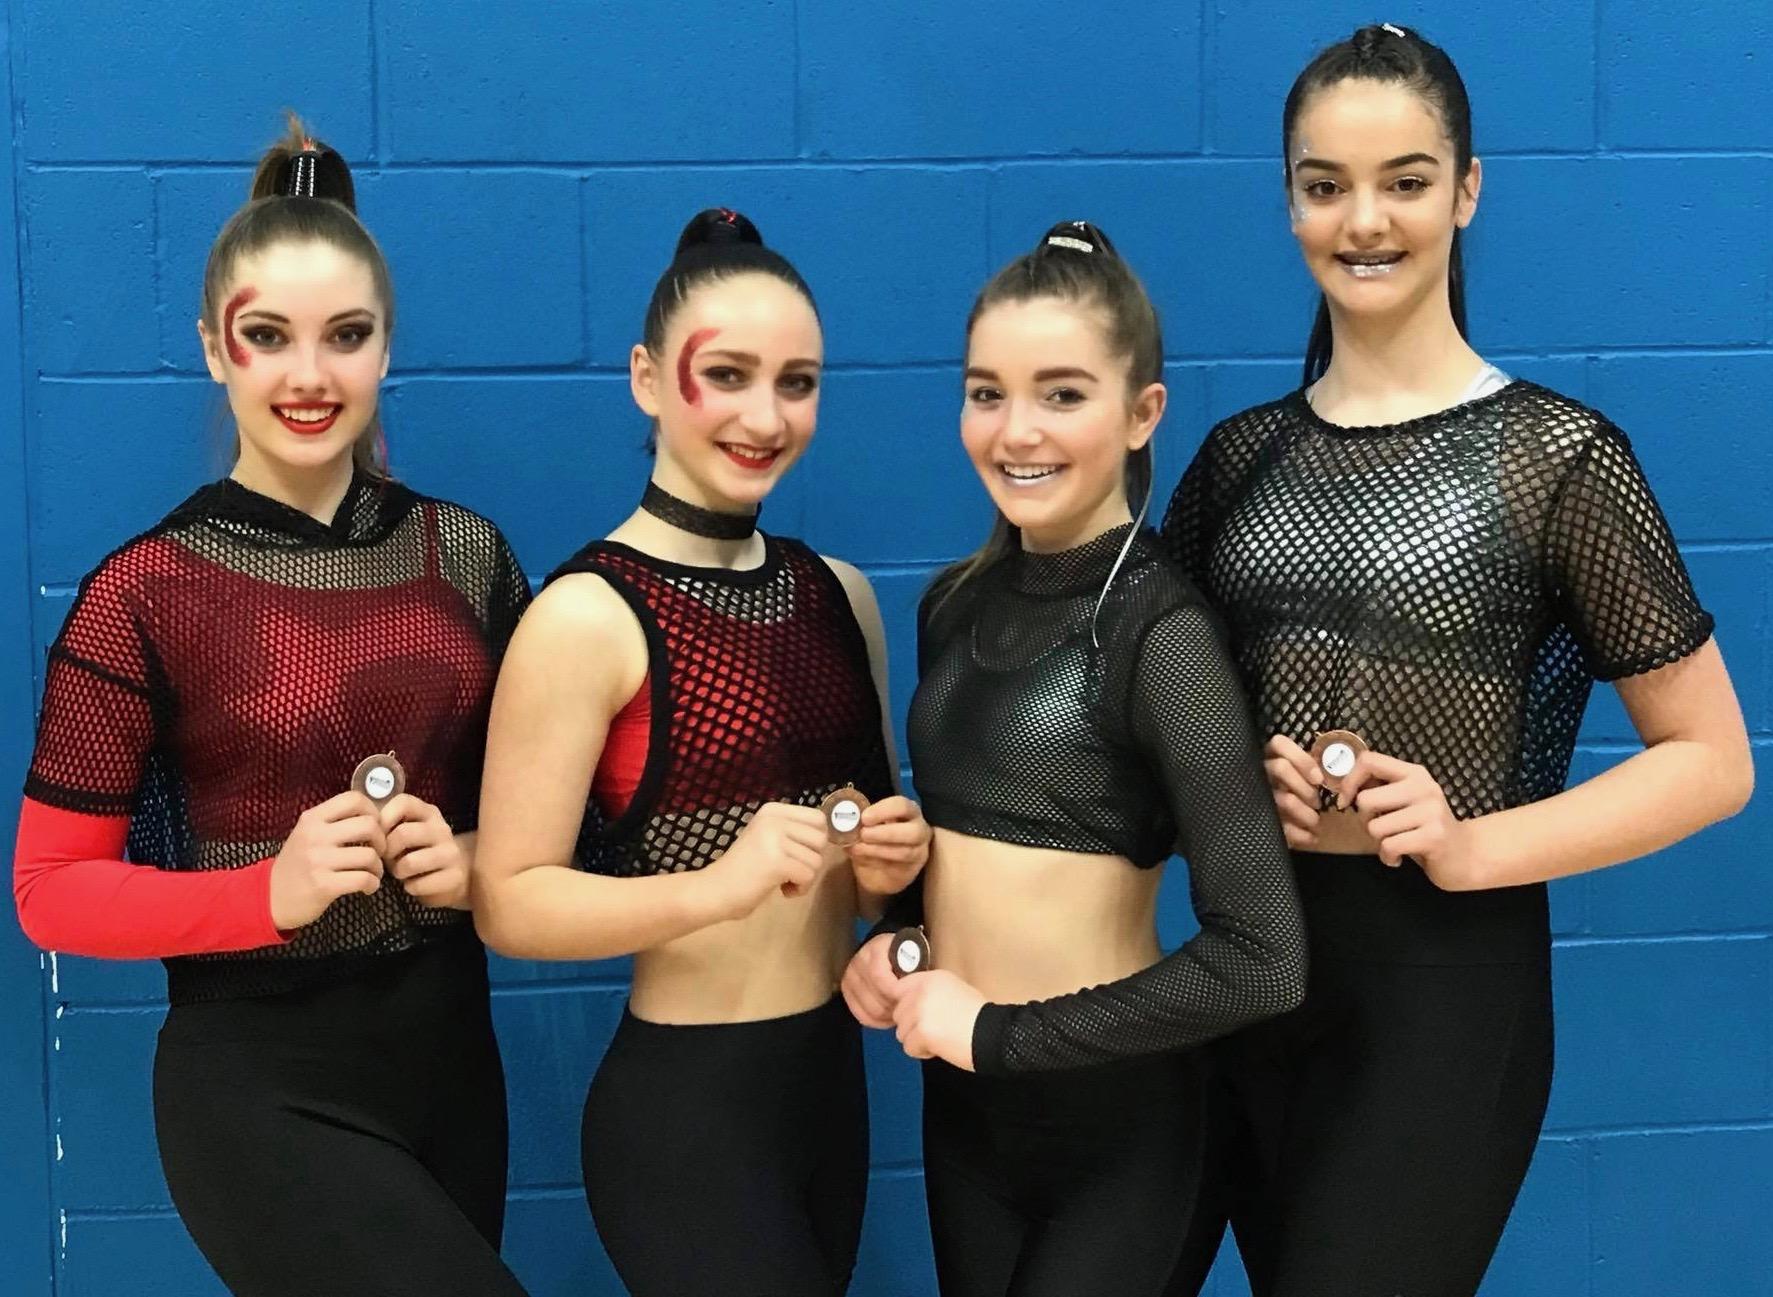 debs-dancers-tap-quartet-joy-gracie-lucy-izzy-battle-of-the-beats-sophie-huntley-85-3rd-Eastbourne (1)